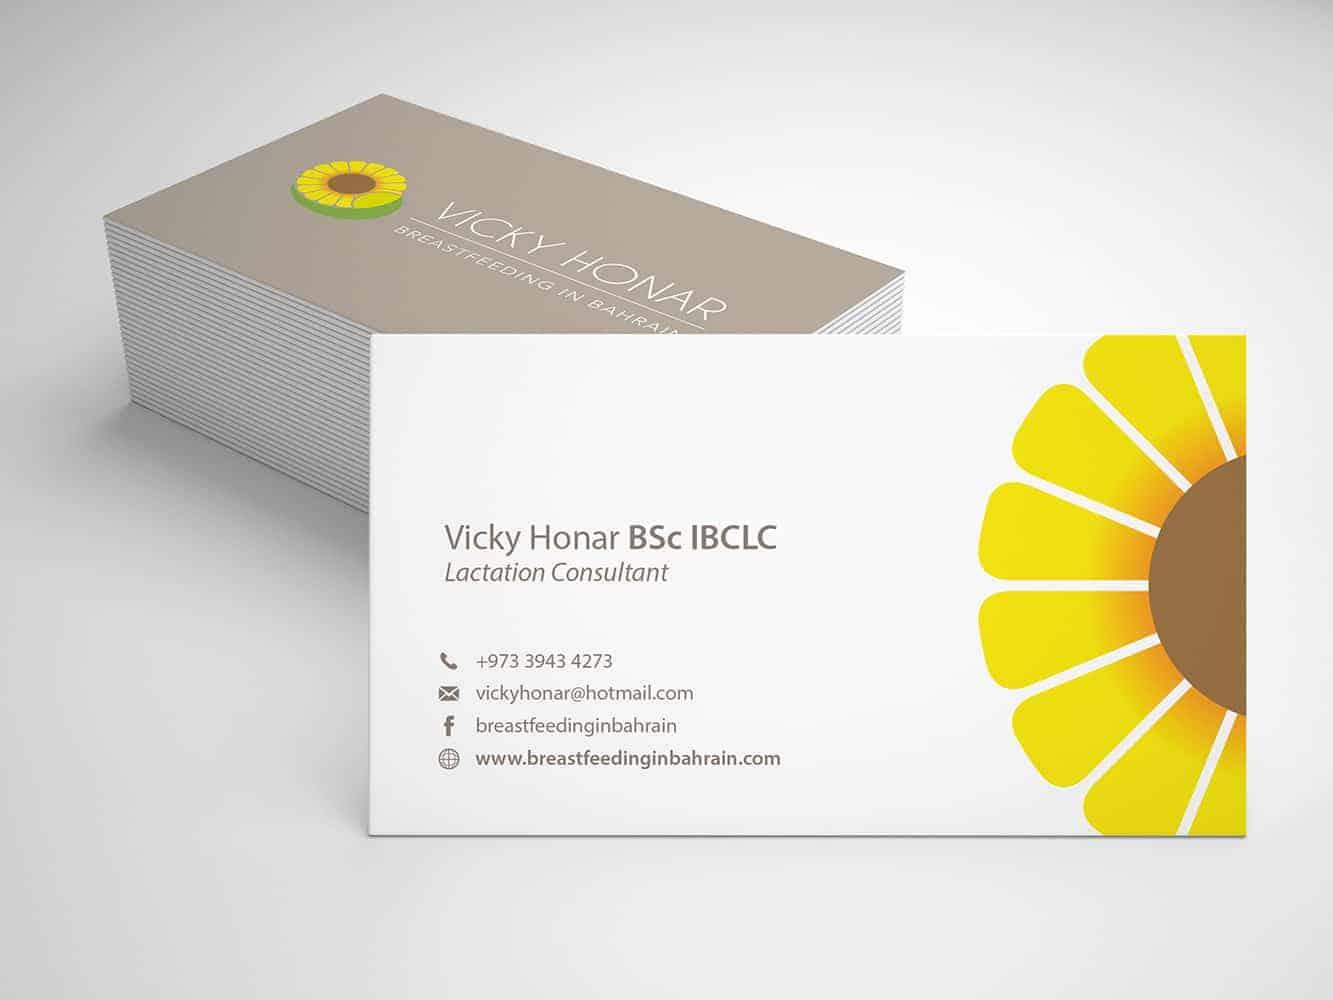 Vicky Honar - Lactation Consultant - Design Ideas